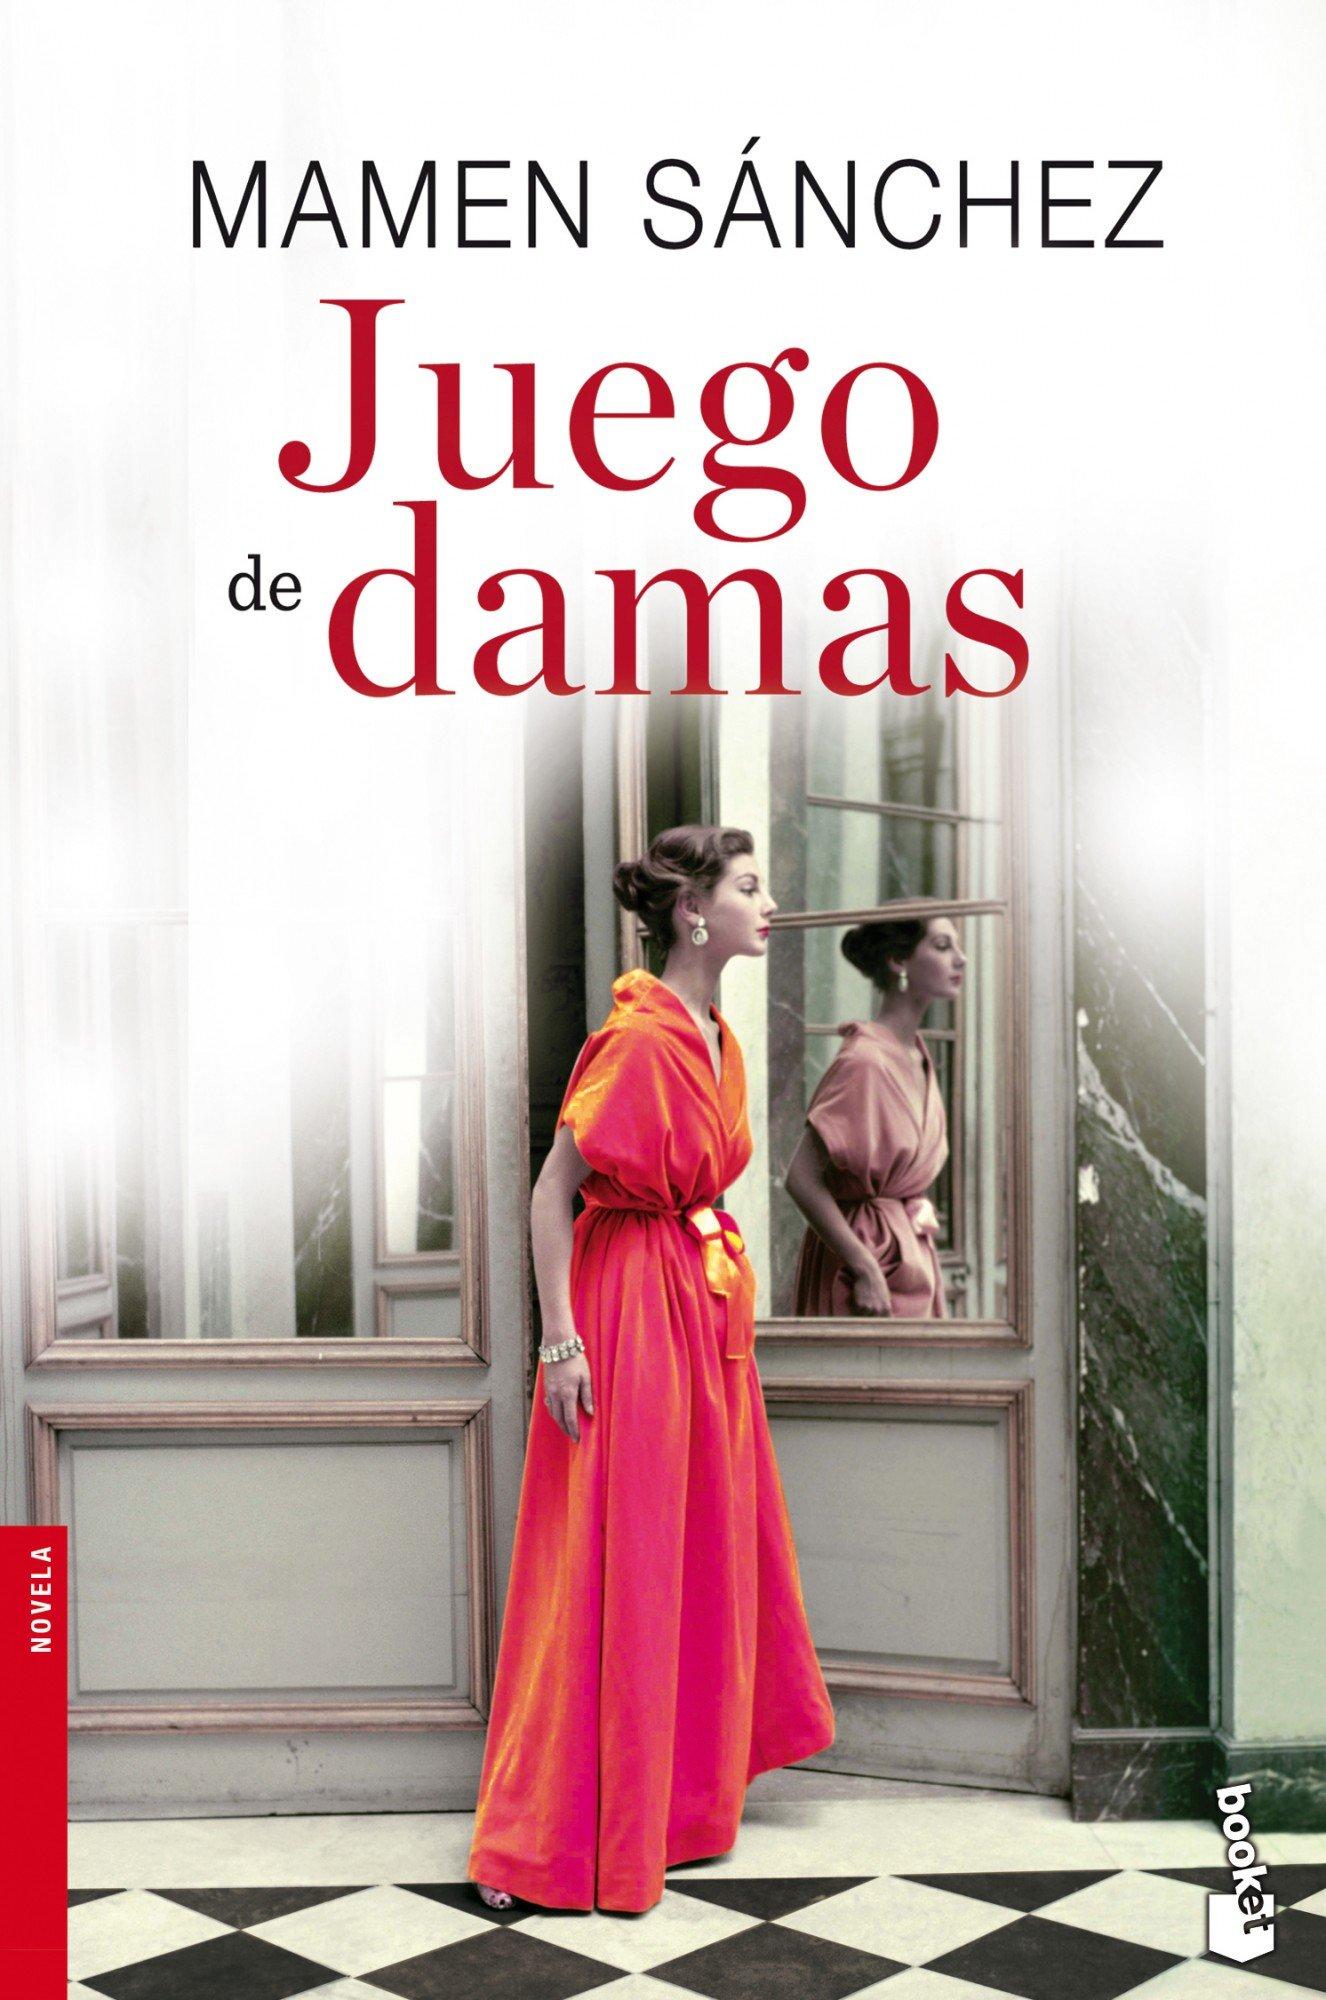 Juego de damas: Mamen Sánchez: 9788467028478: Amazon.com: Books